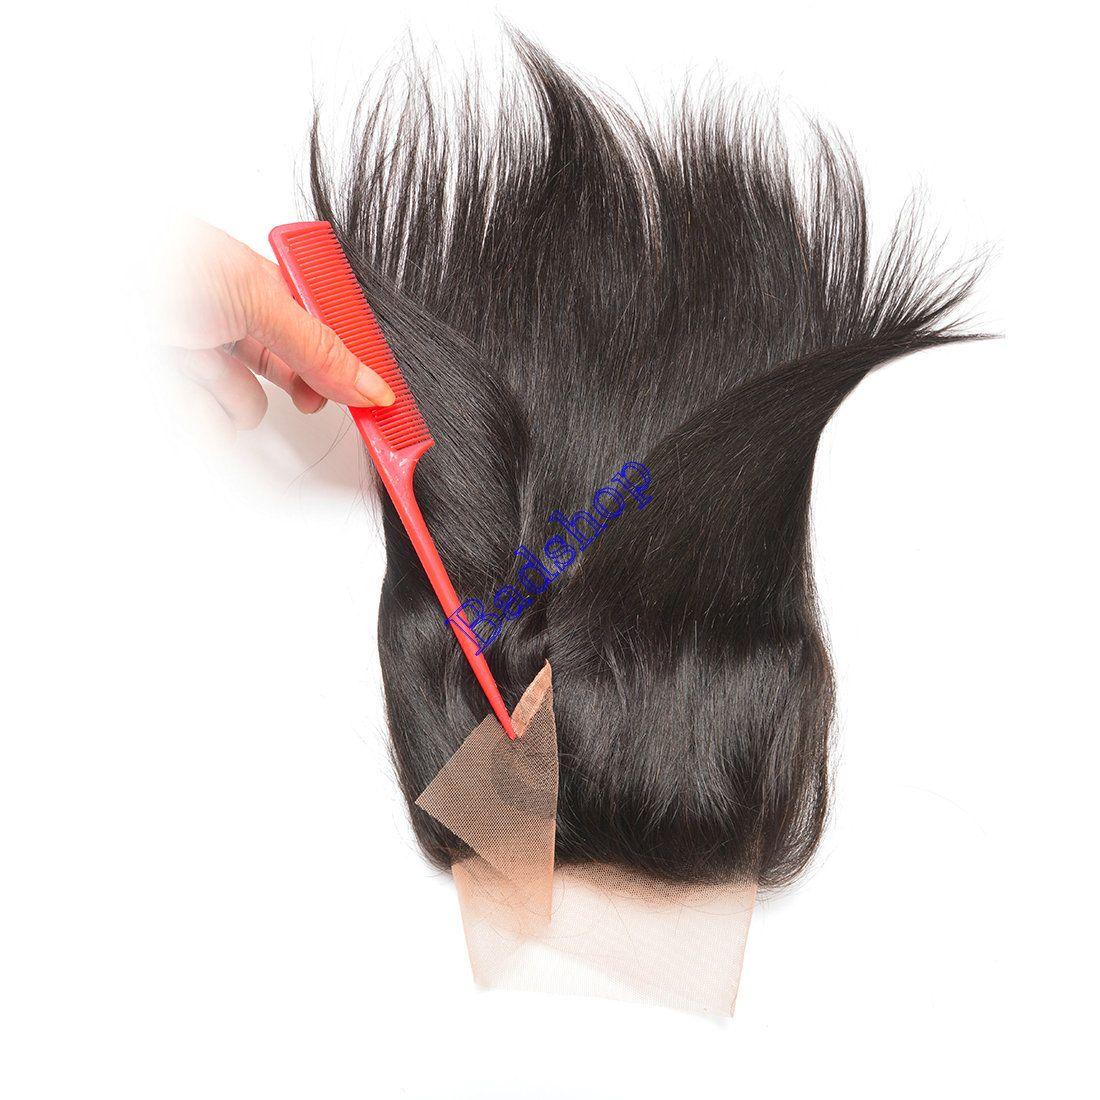 13x4 실키 스트레이트 사전 뽑아 레이스 정면 폐쇄와 아기 머리 인도 레미 처녀 인간의 머리 레이스 정면으로 번들 무료 배송